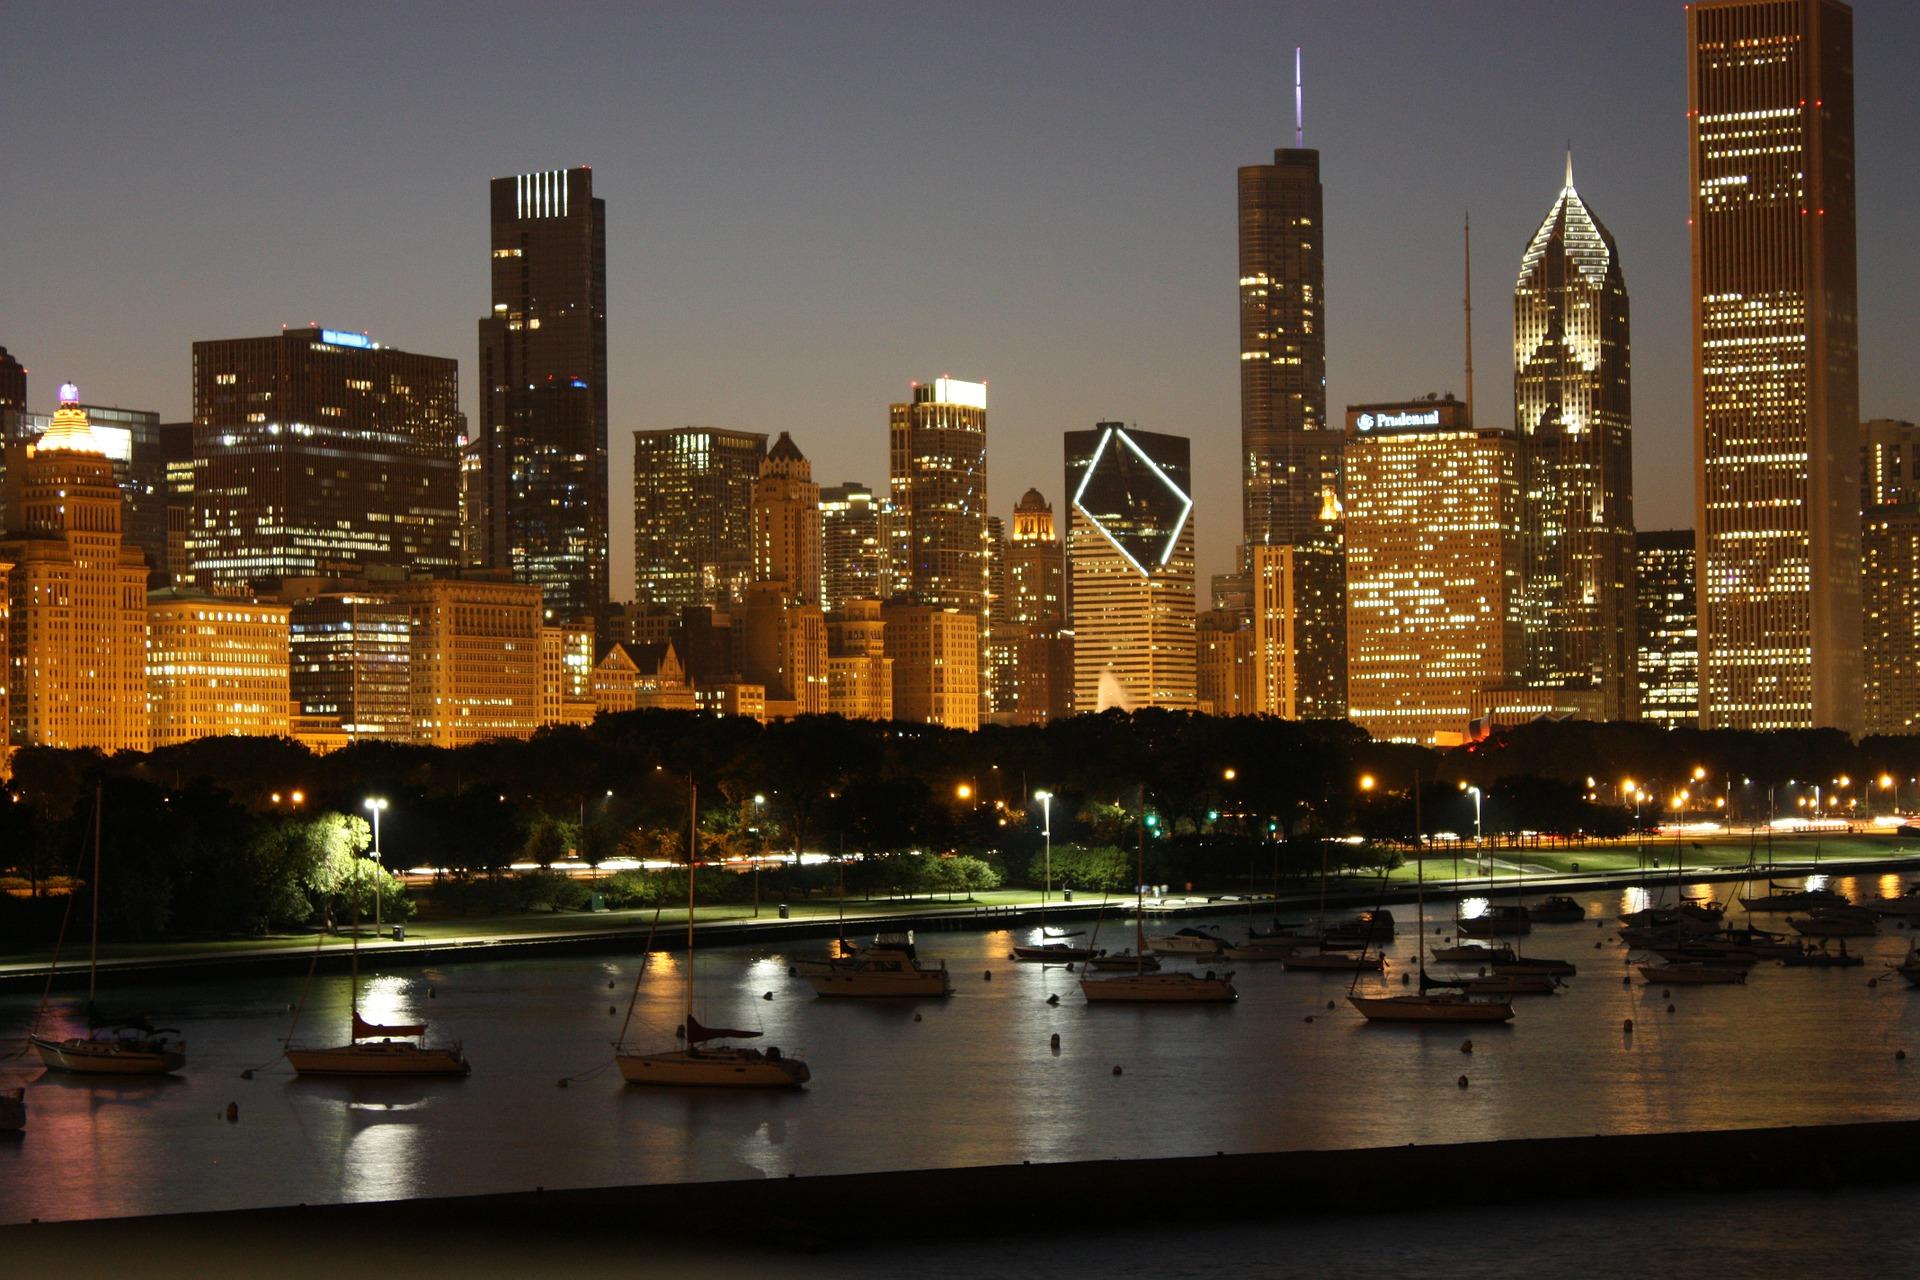 city-skyline-599801_1920.jpg